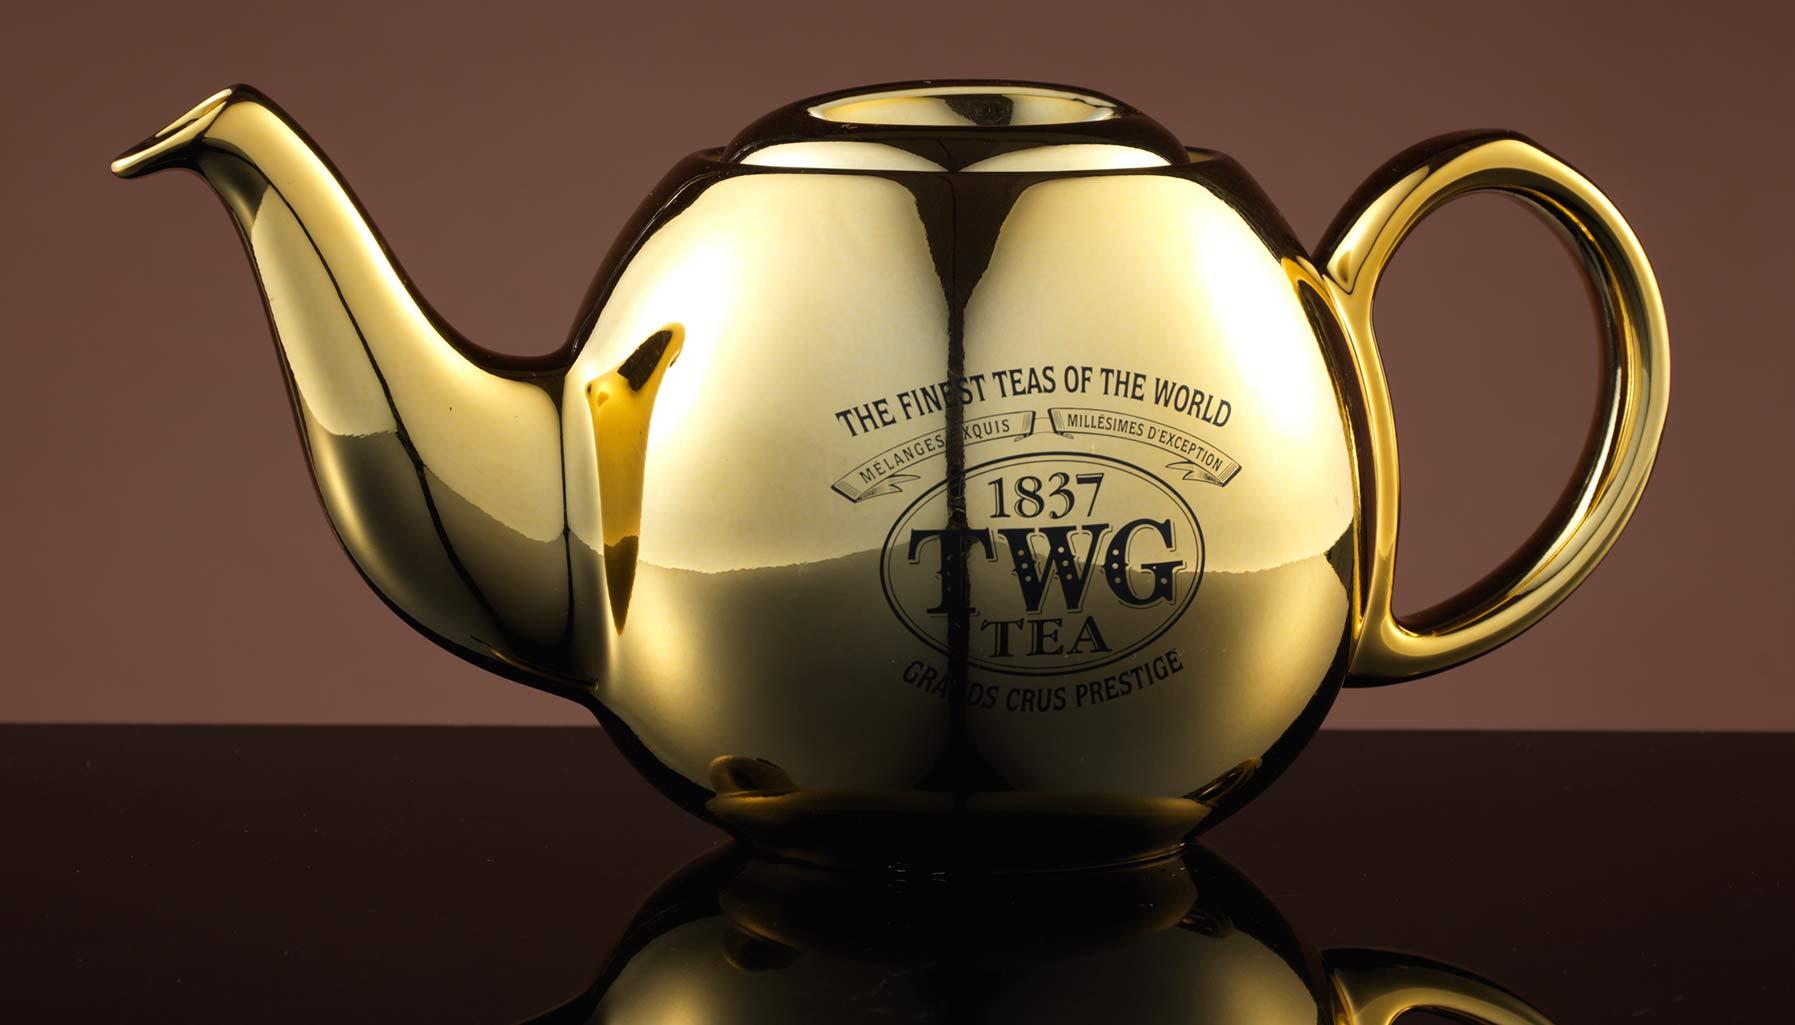 TWG Tea gifts